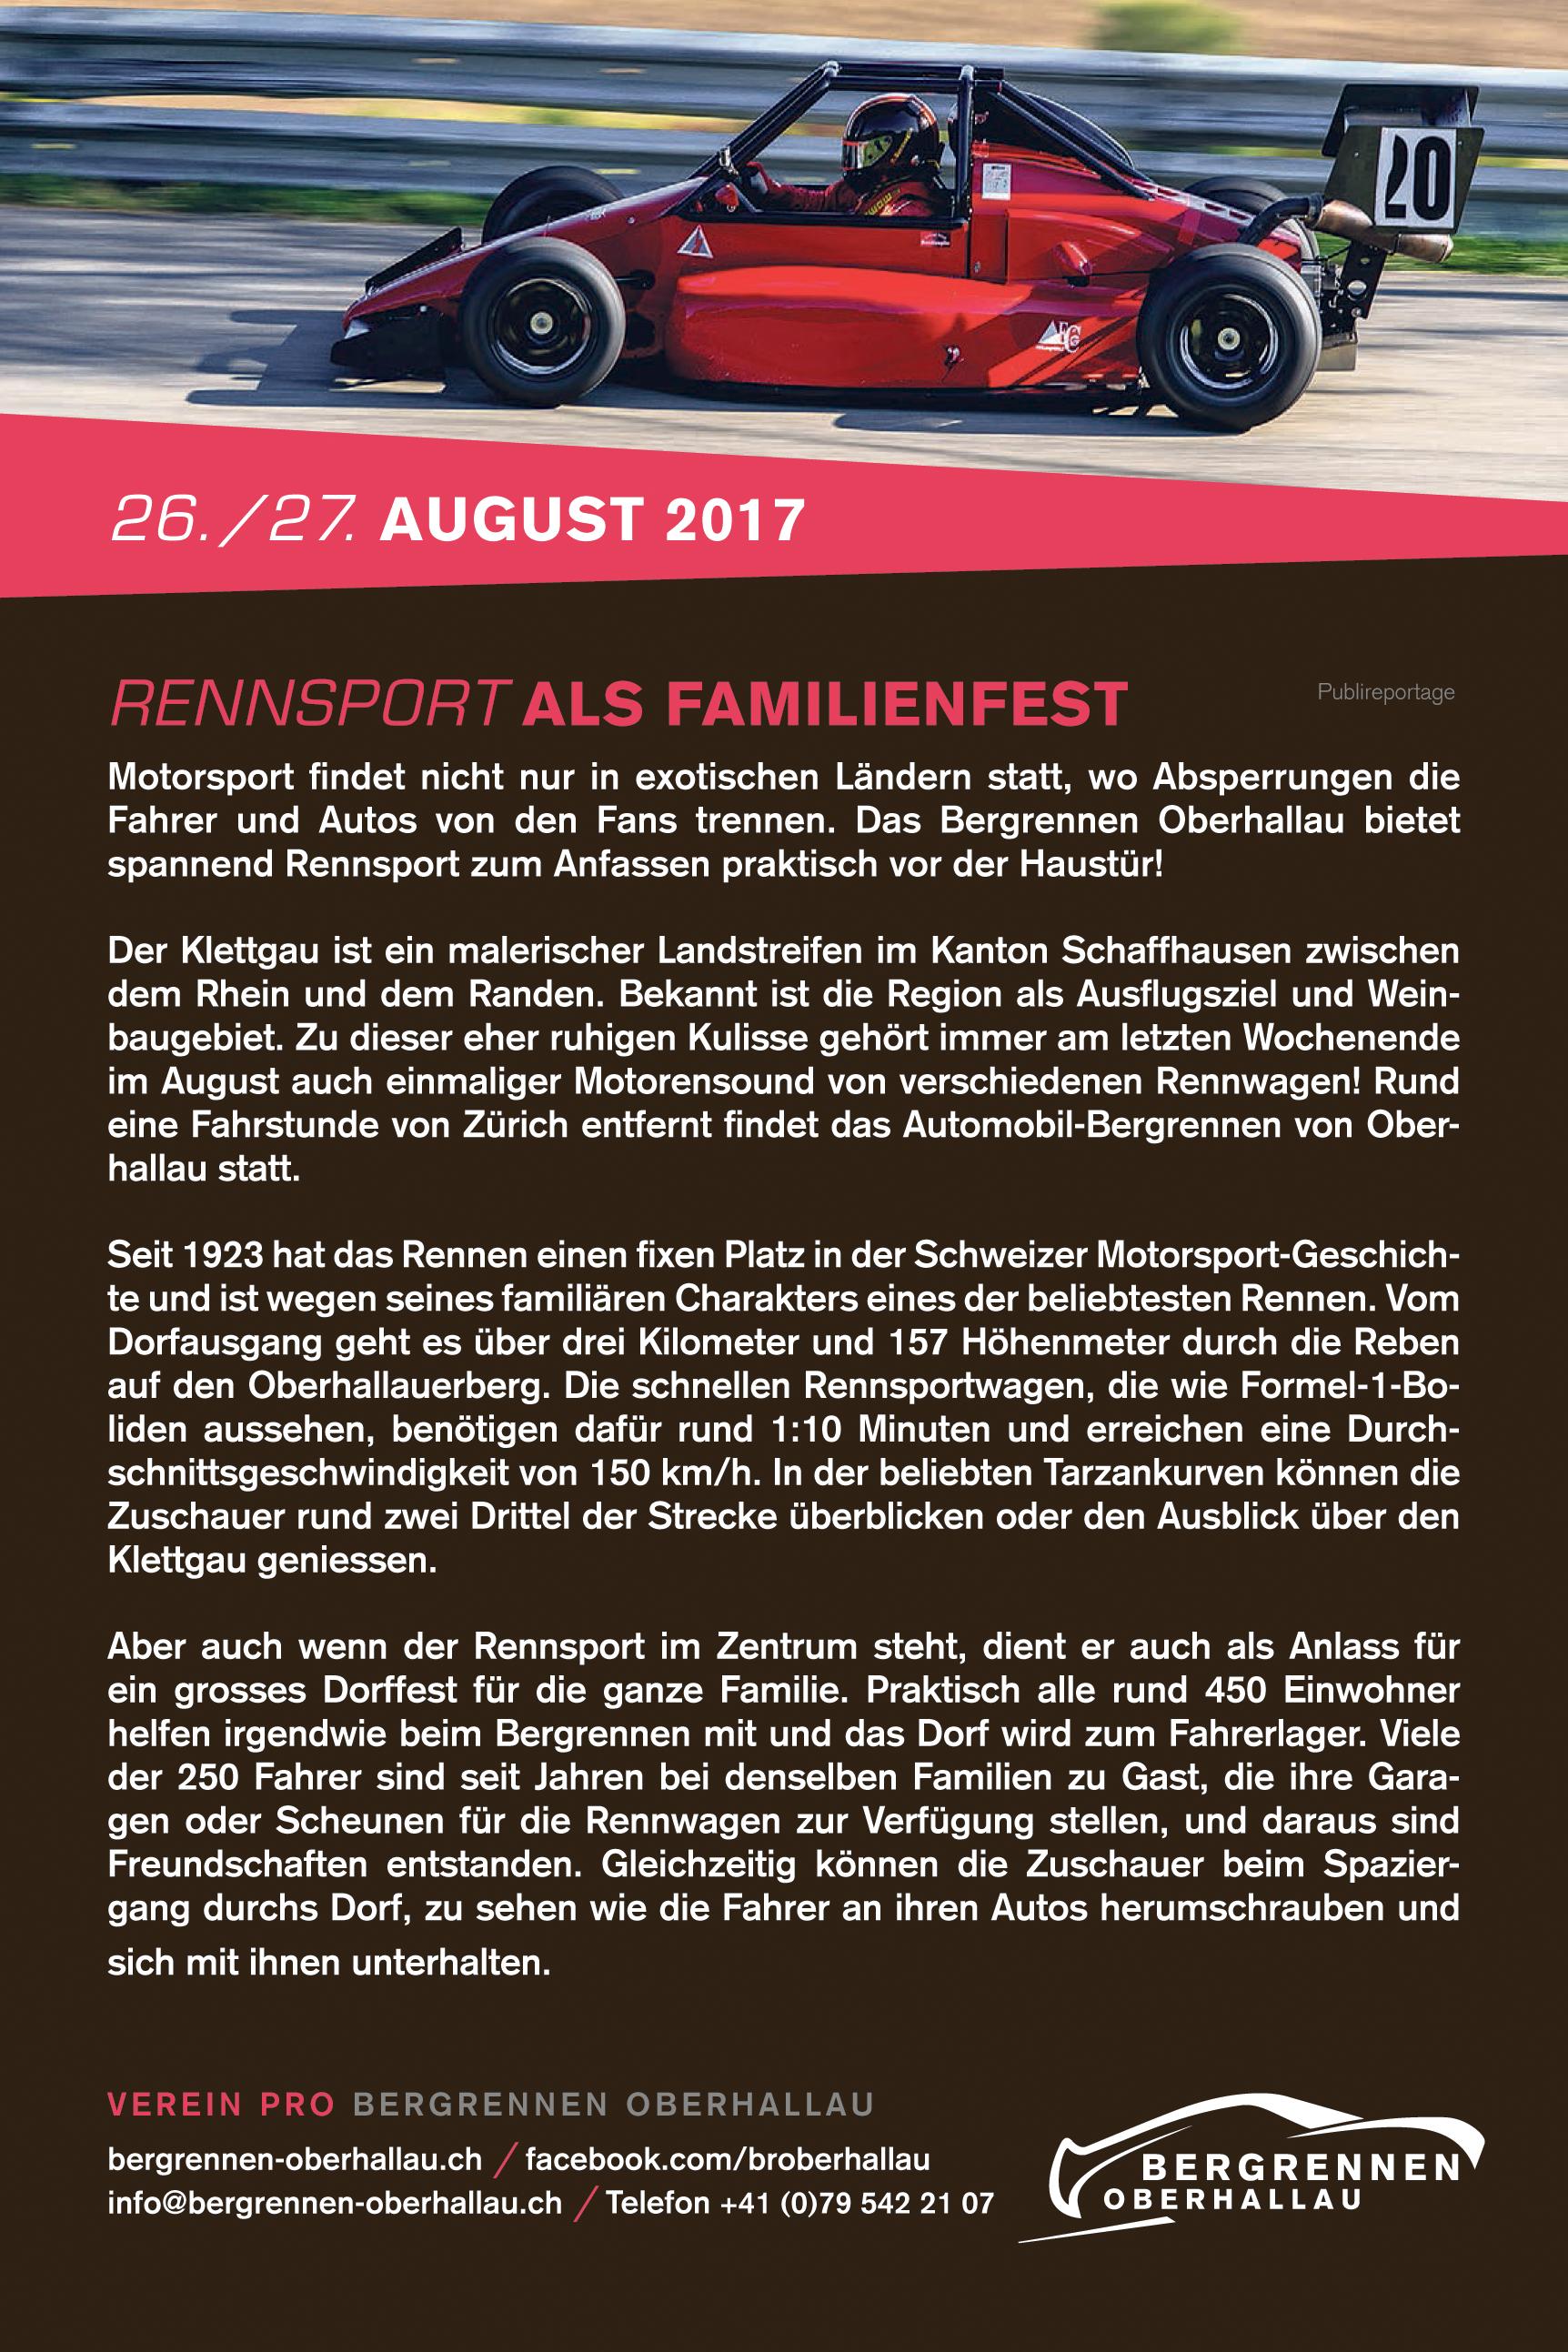 Publireportage - Rennsport als Familienfest